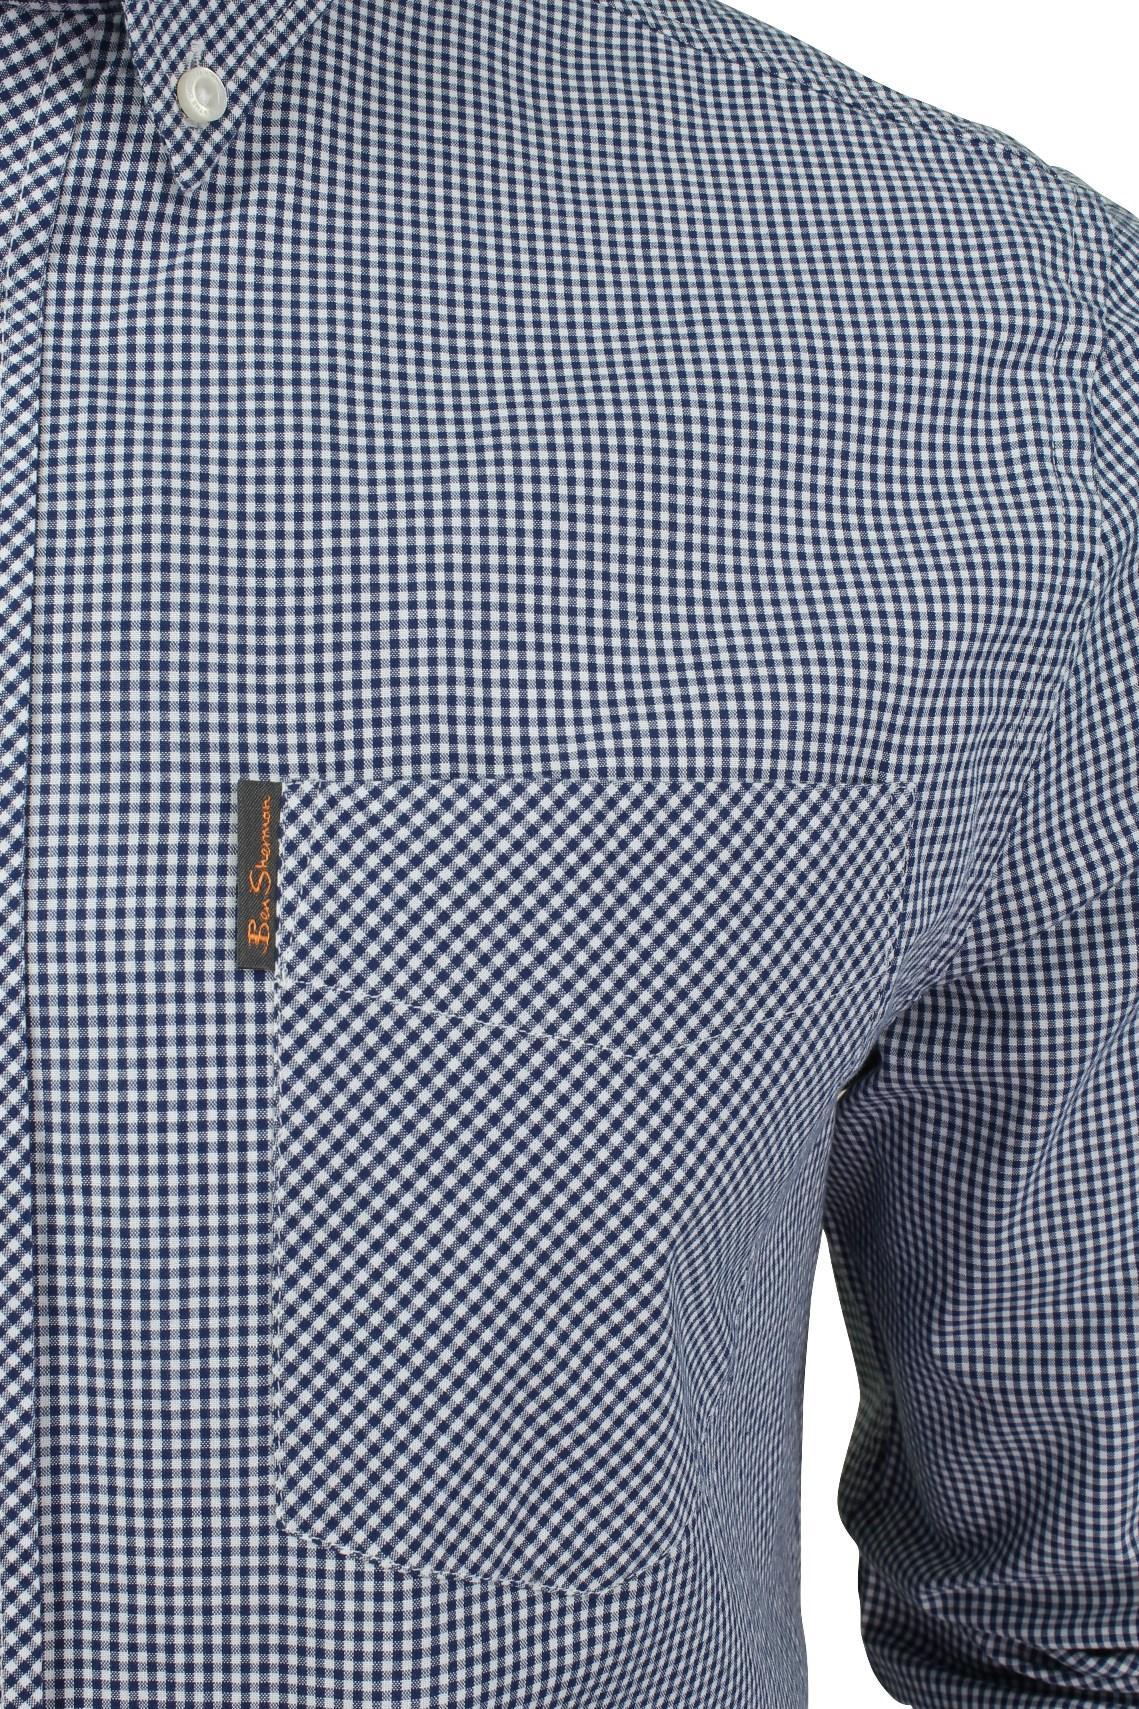 Mens-Classic-Gingham-Shirt-by-Ben-Sherman-Long-Sleeved thumbnail 4